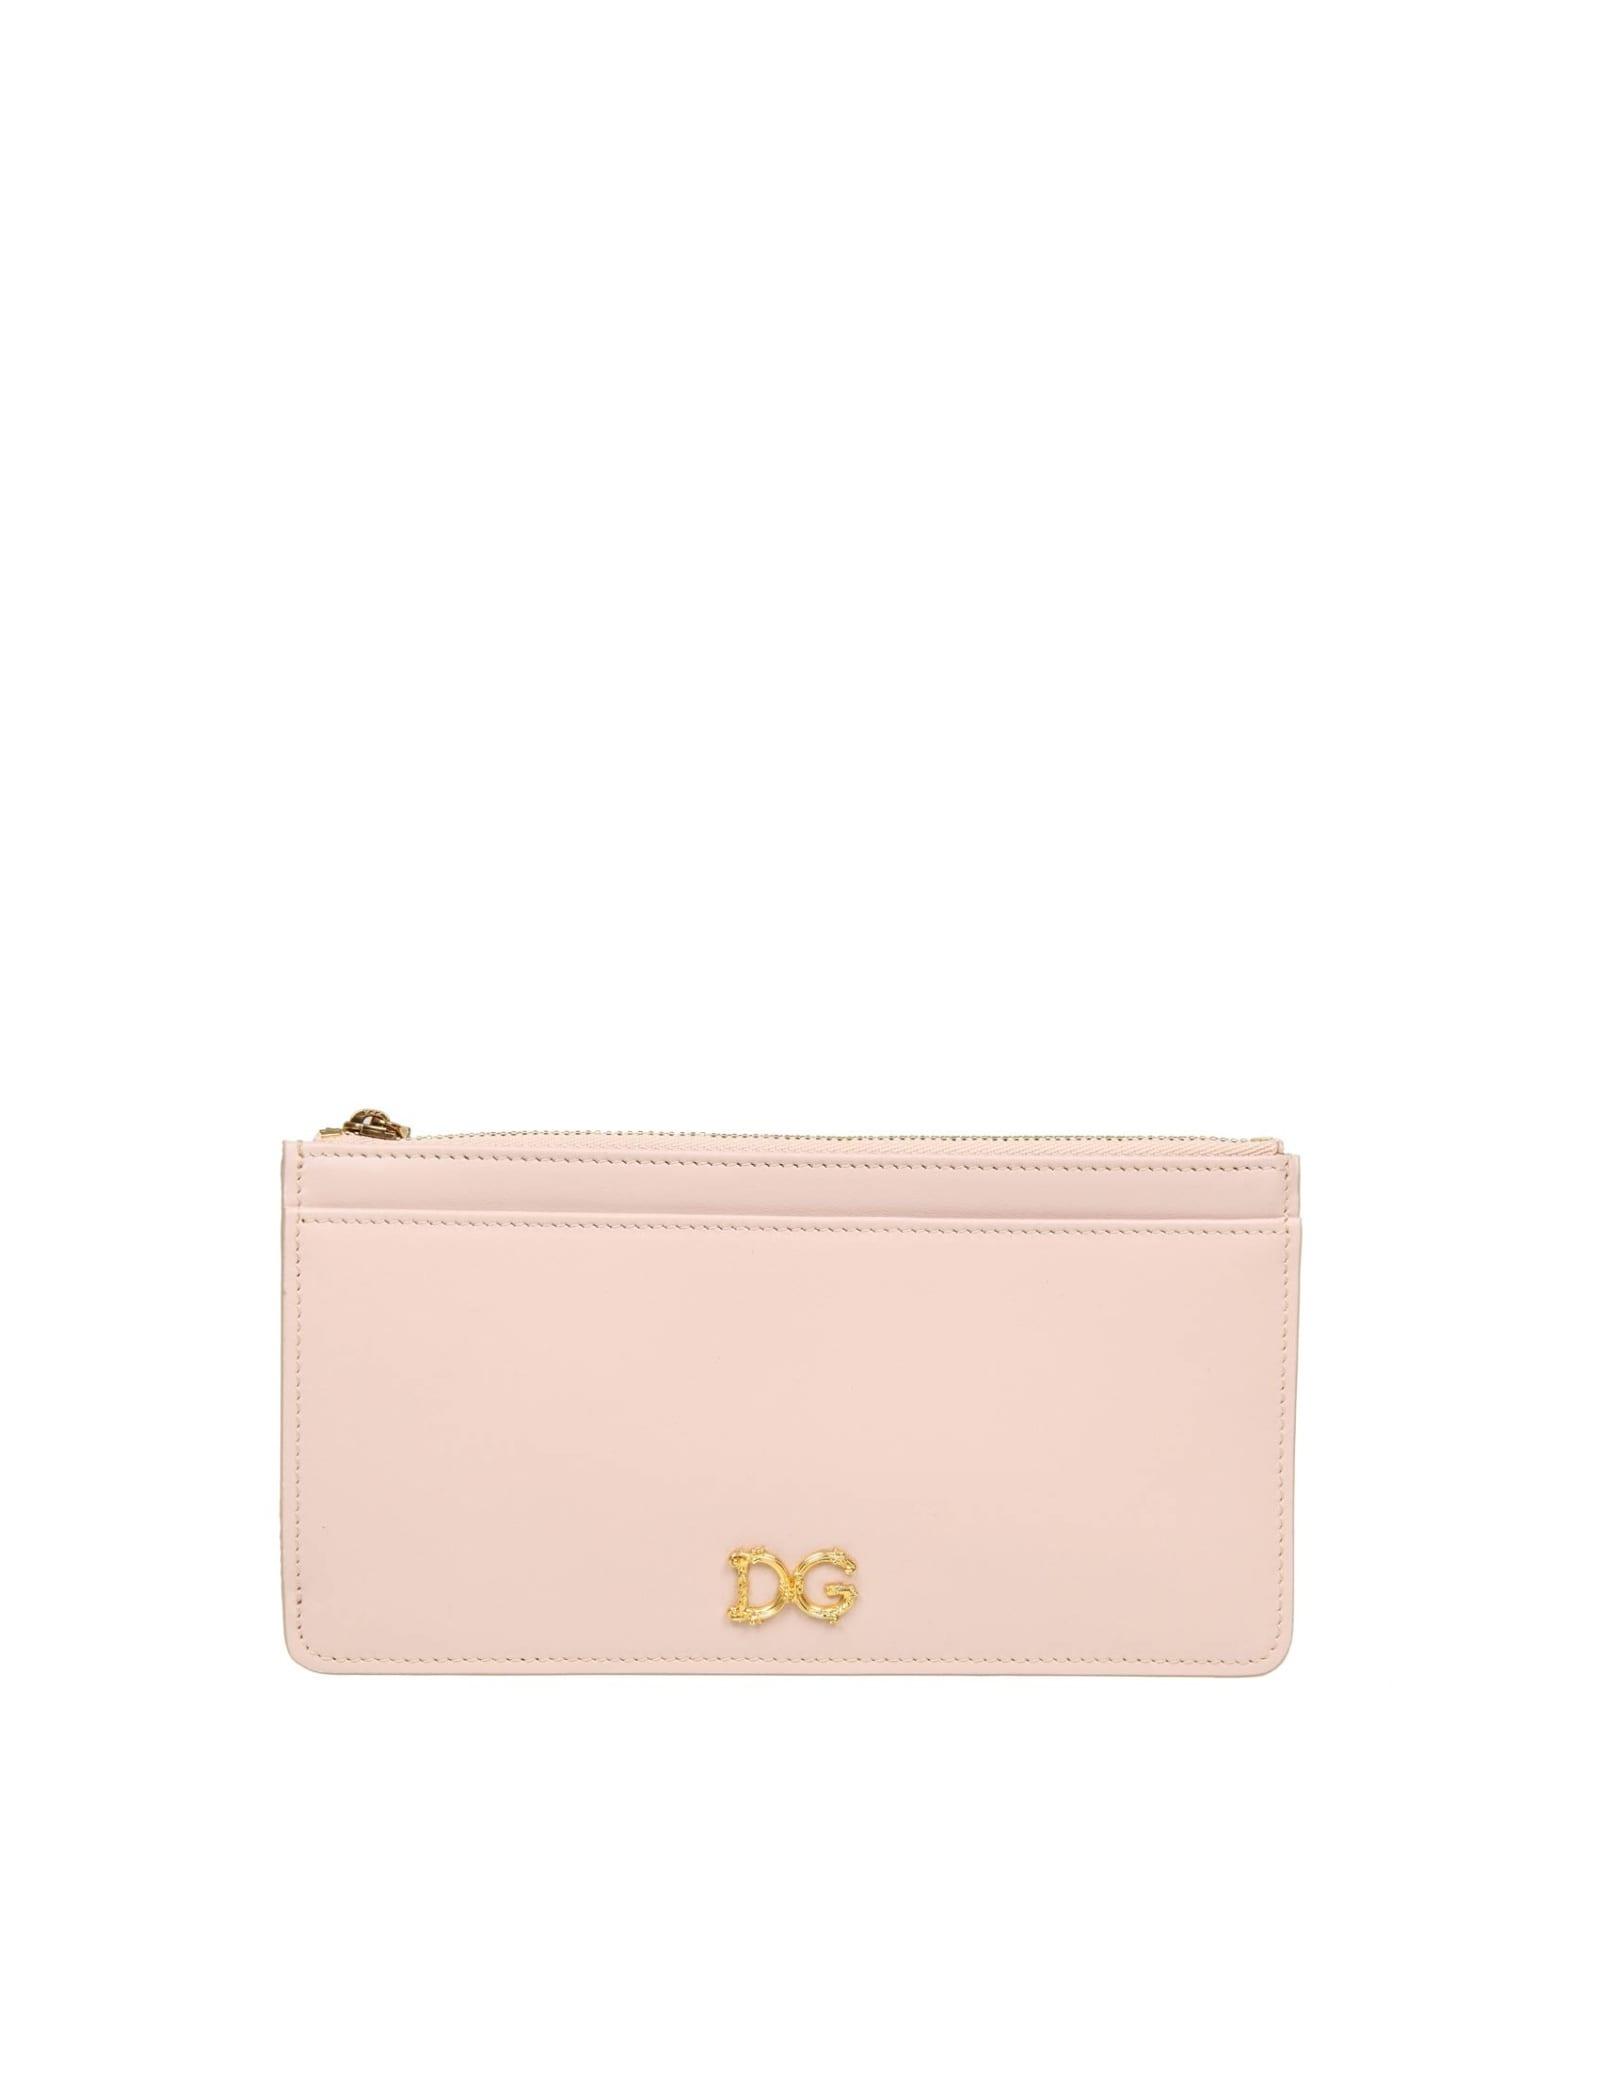 Dolce & Gabbana POWDER CARD HOLDER COLOR POWDER